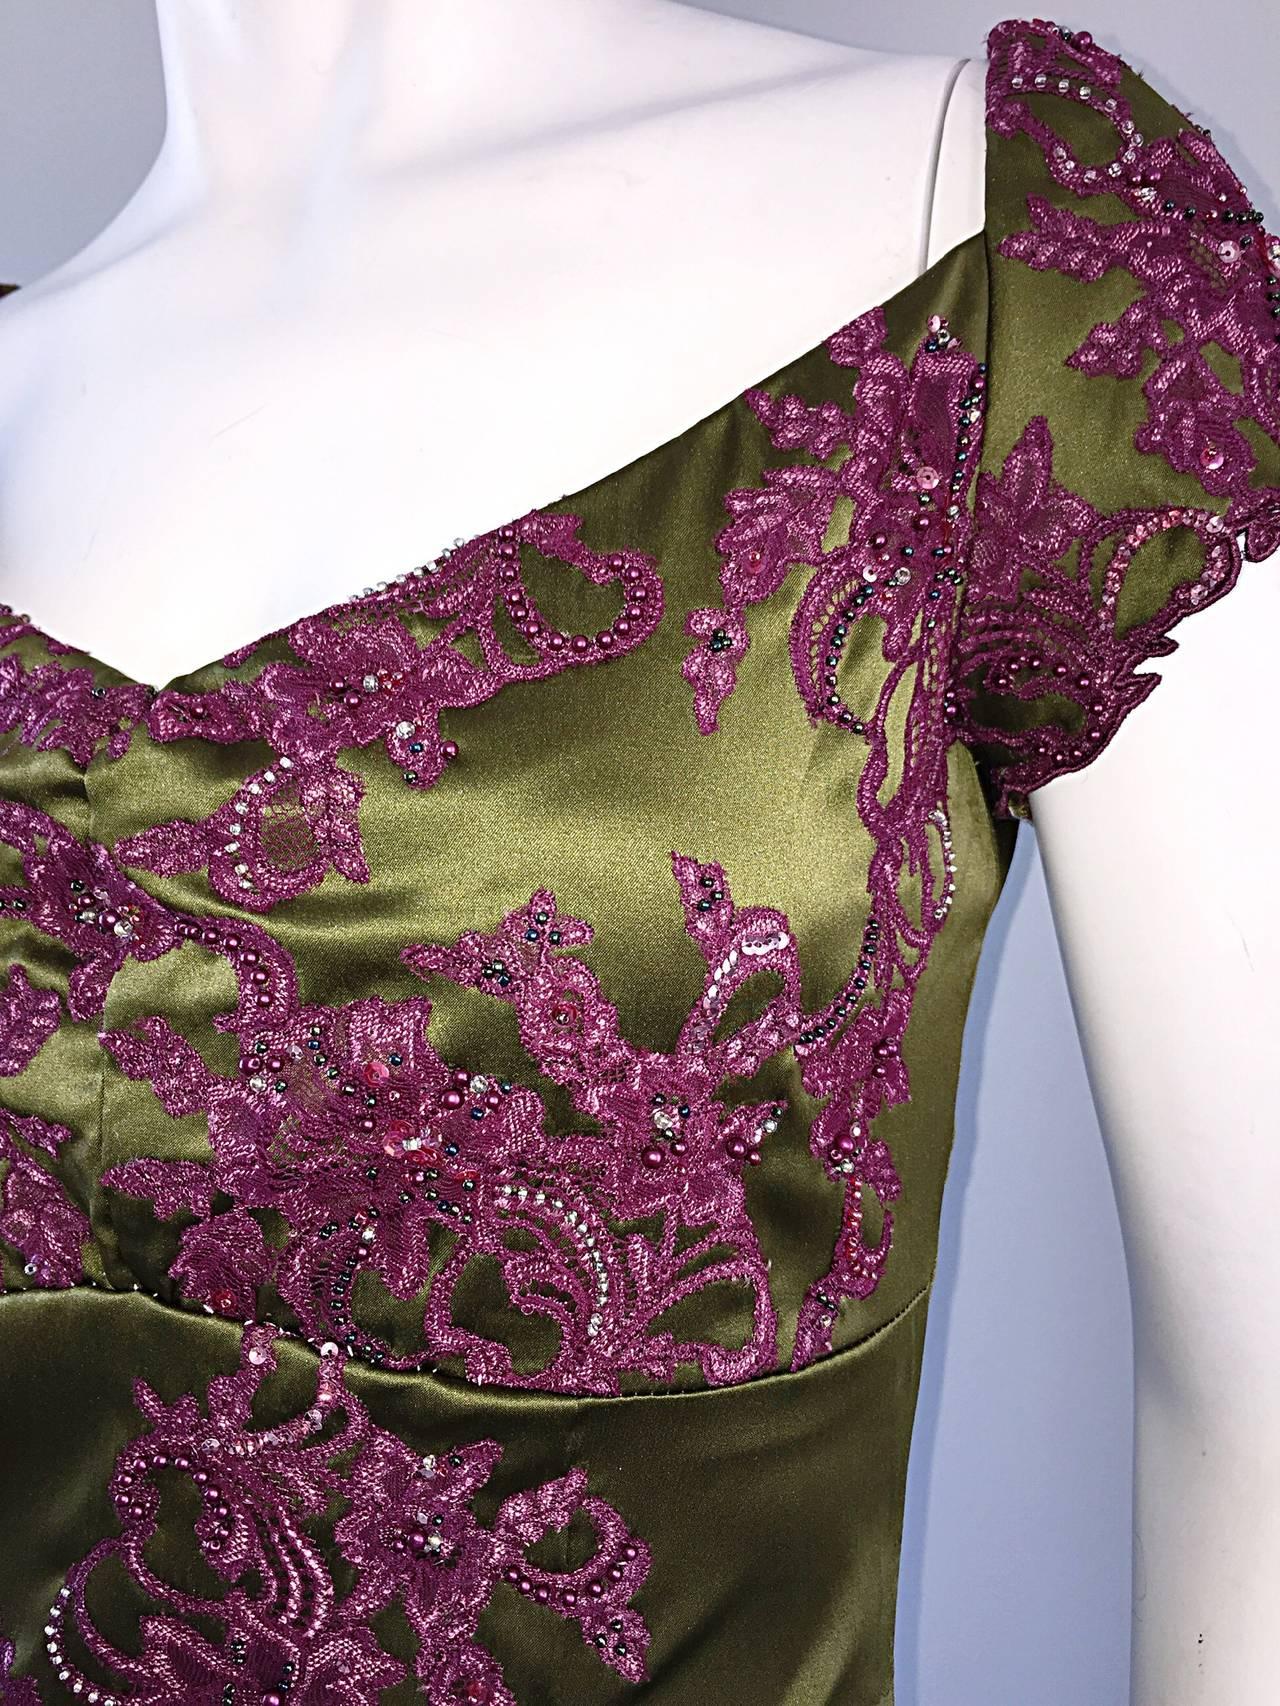 Beautiful Mandalay Chartreuse Merlot Sz 6 Silk Bombshell Dress w/ Beading & Lace For Sale 1